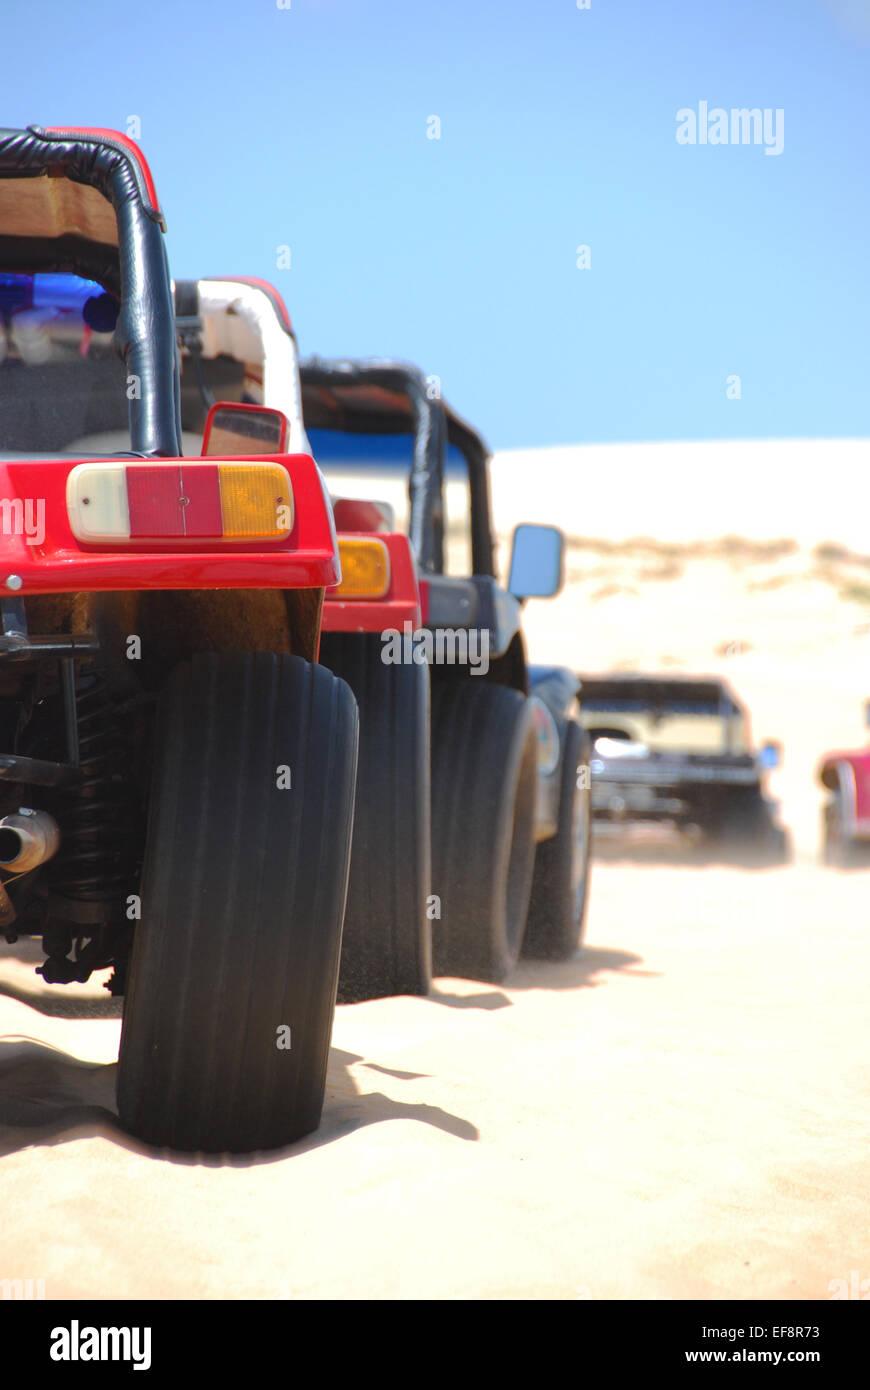 Brazil, Northeast Region, Ceara, Jijoca de Jericoacoara, Beach buggies parked in row on sand - Stock Image